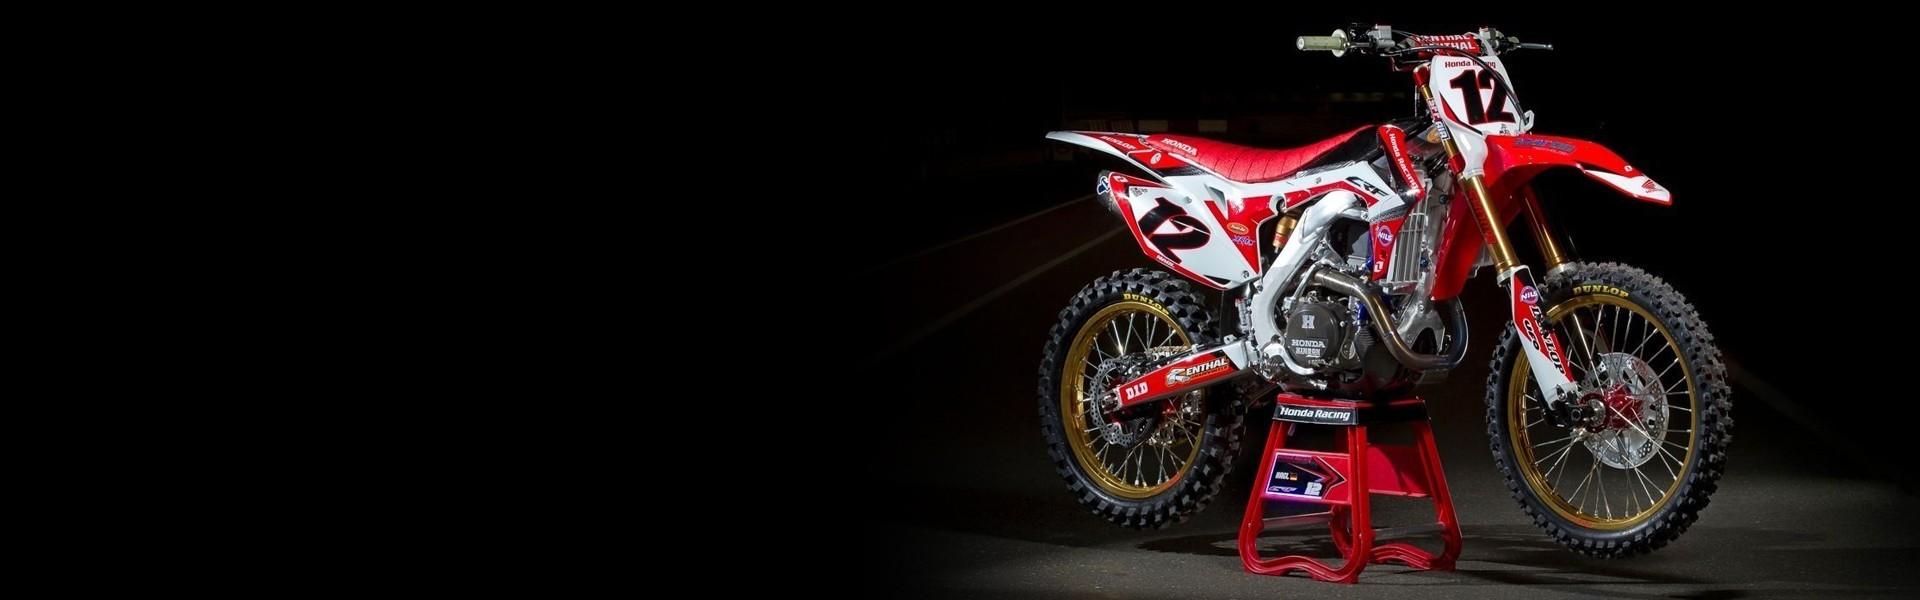 Kits de adhesivos moto Honda